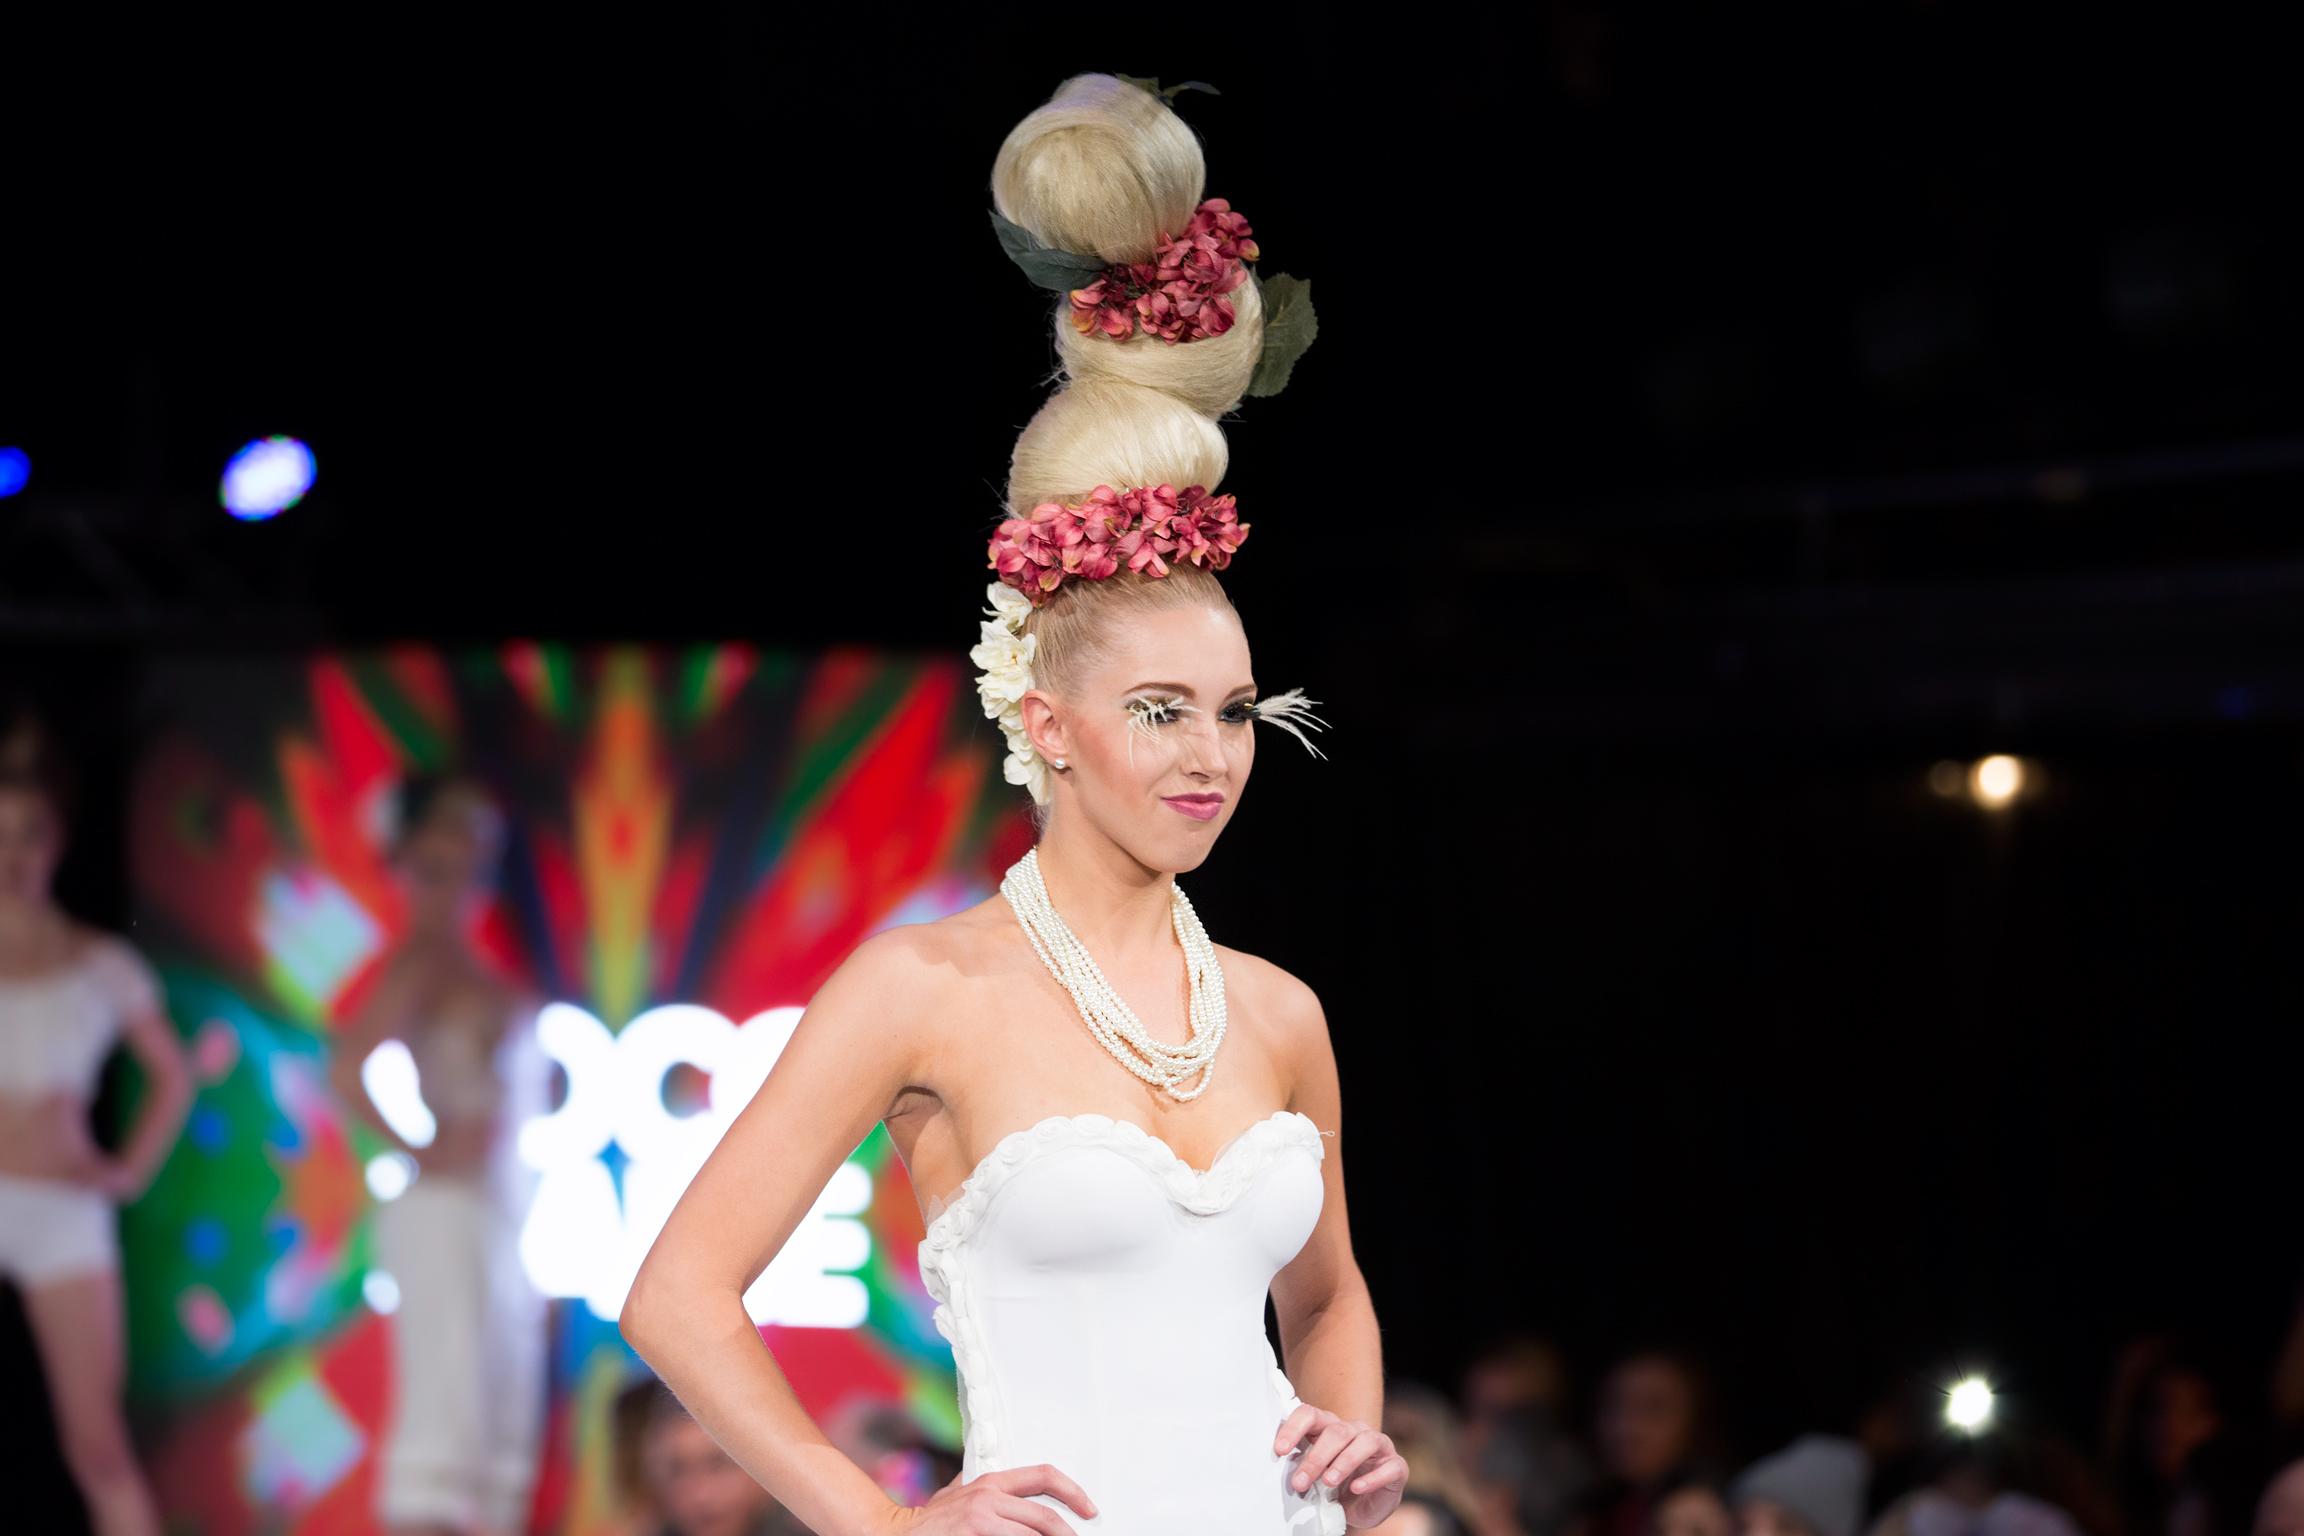 Denver-Fashion-Week-Day-4-_-Coco-Marie---011.jpg